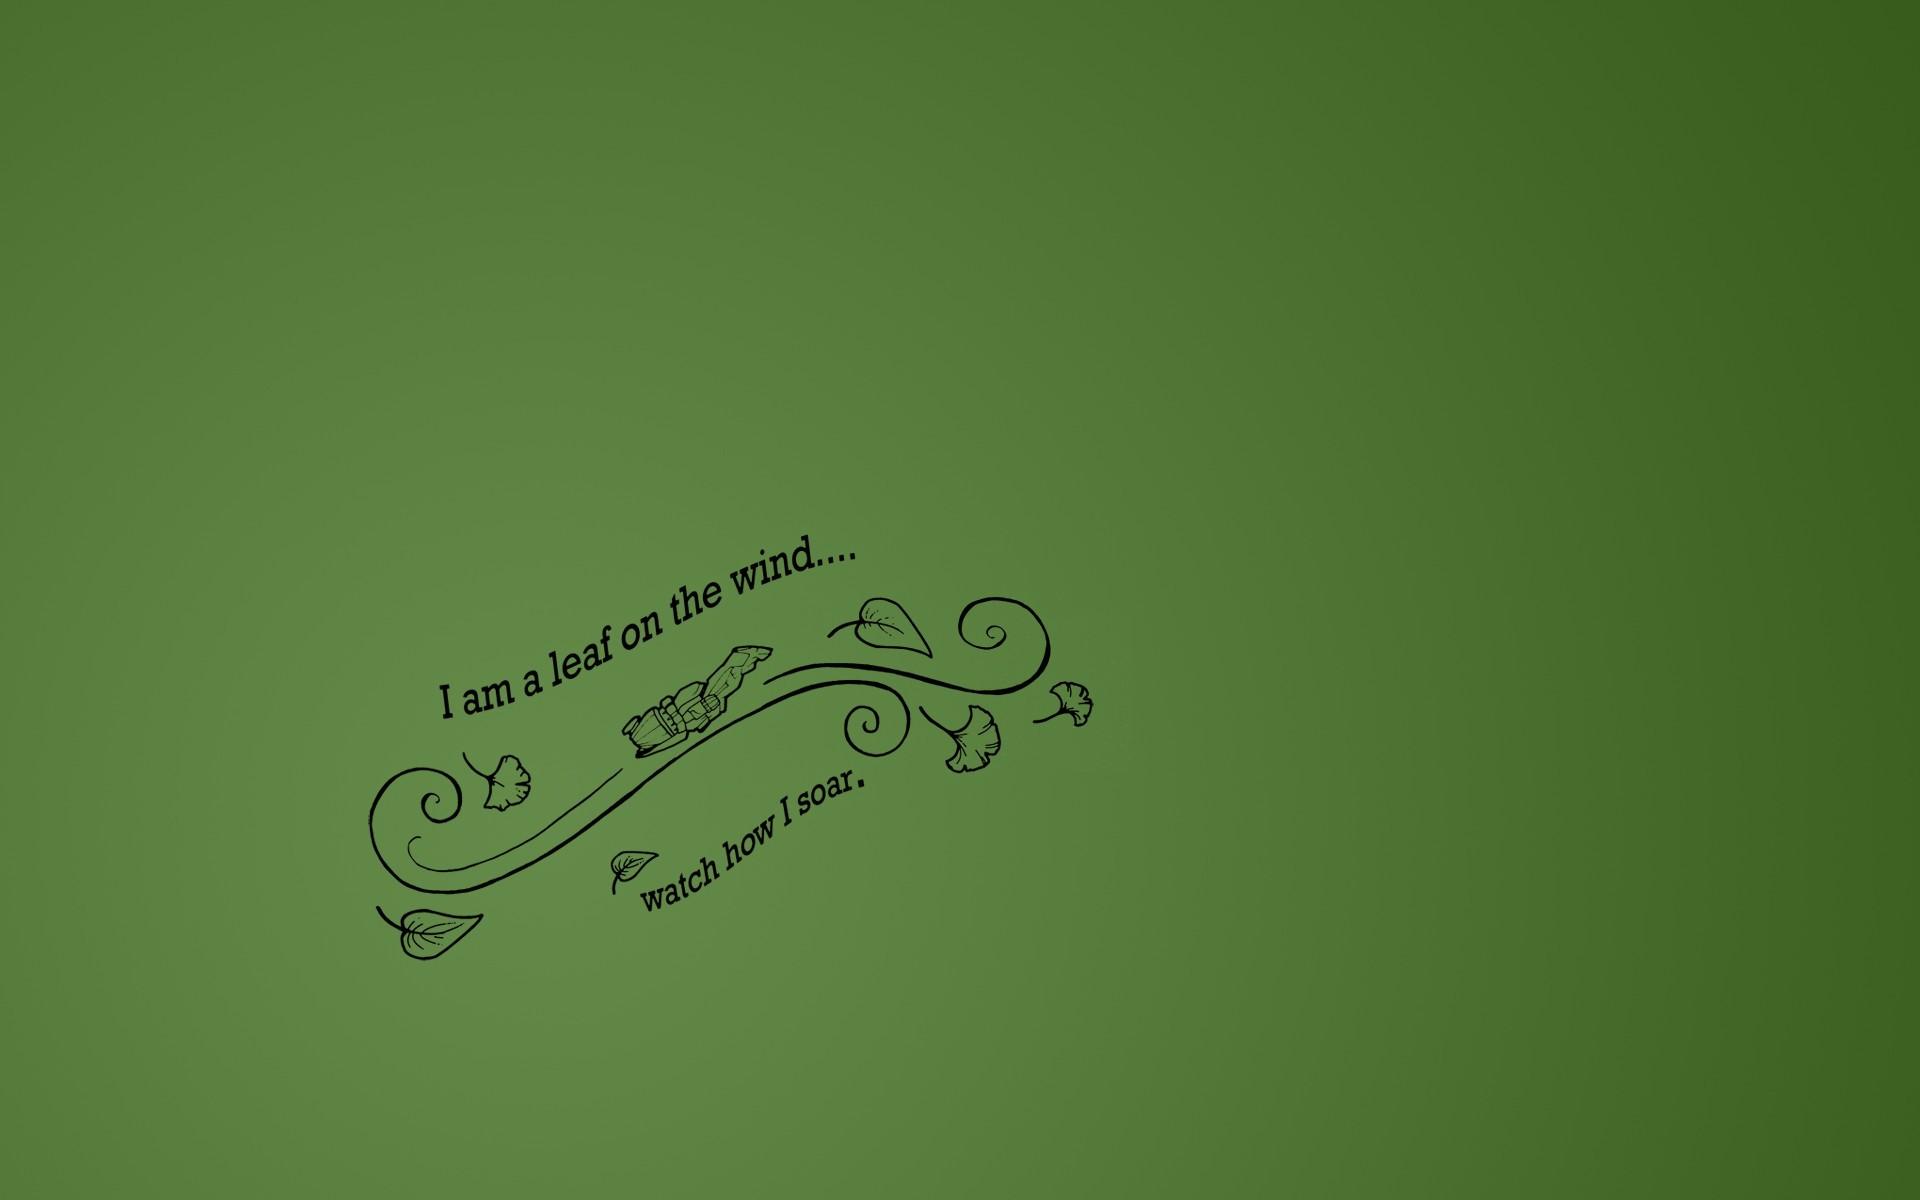 I am a leaf on the wind – qwertee shirt design as a wallpaper